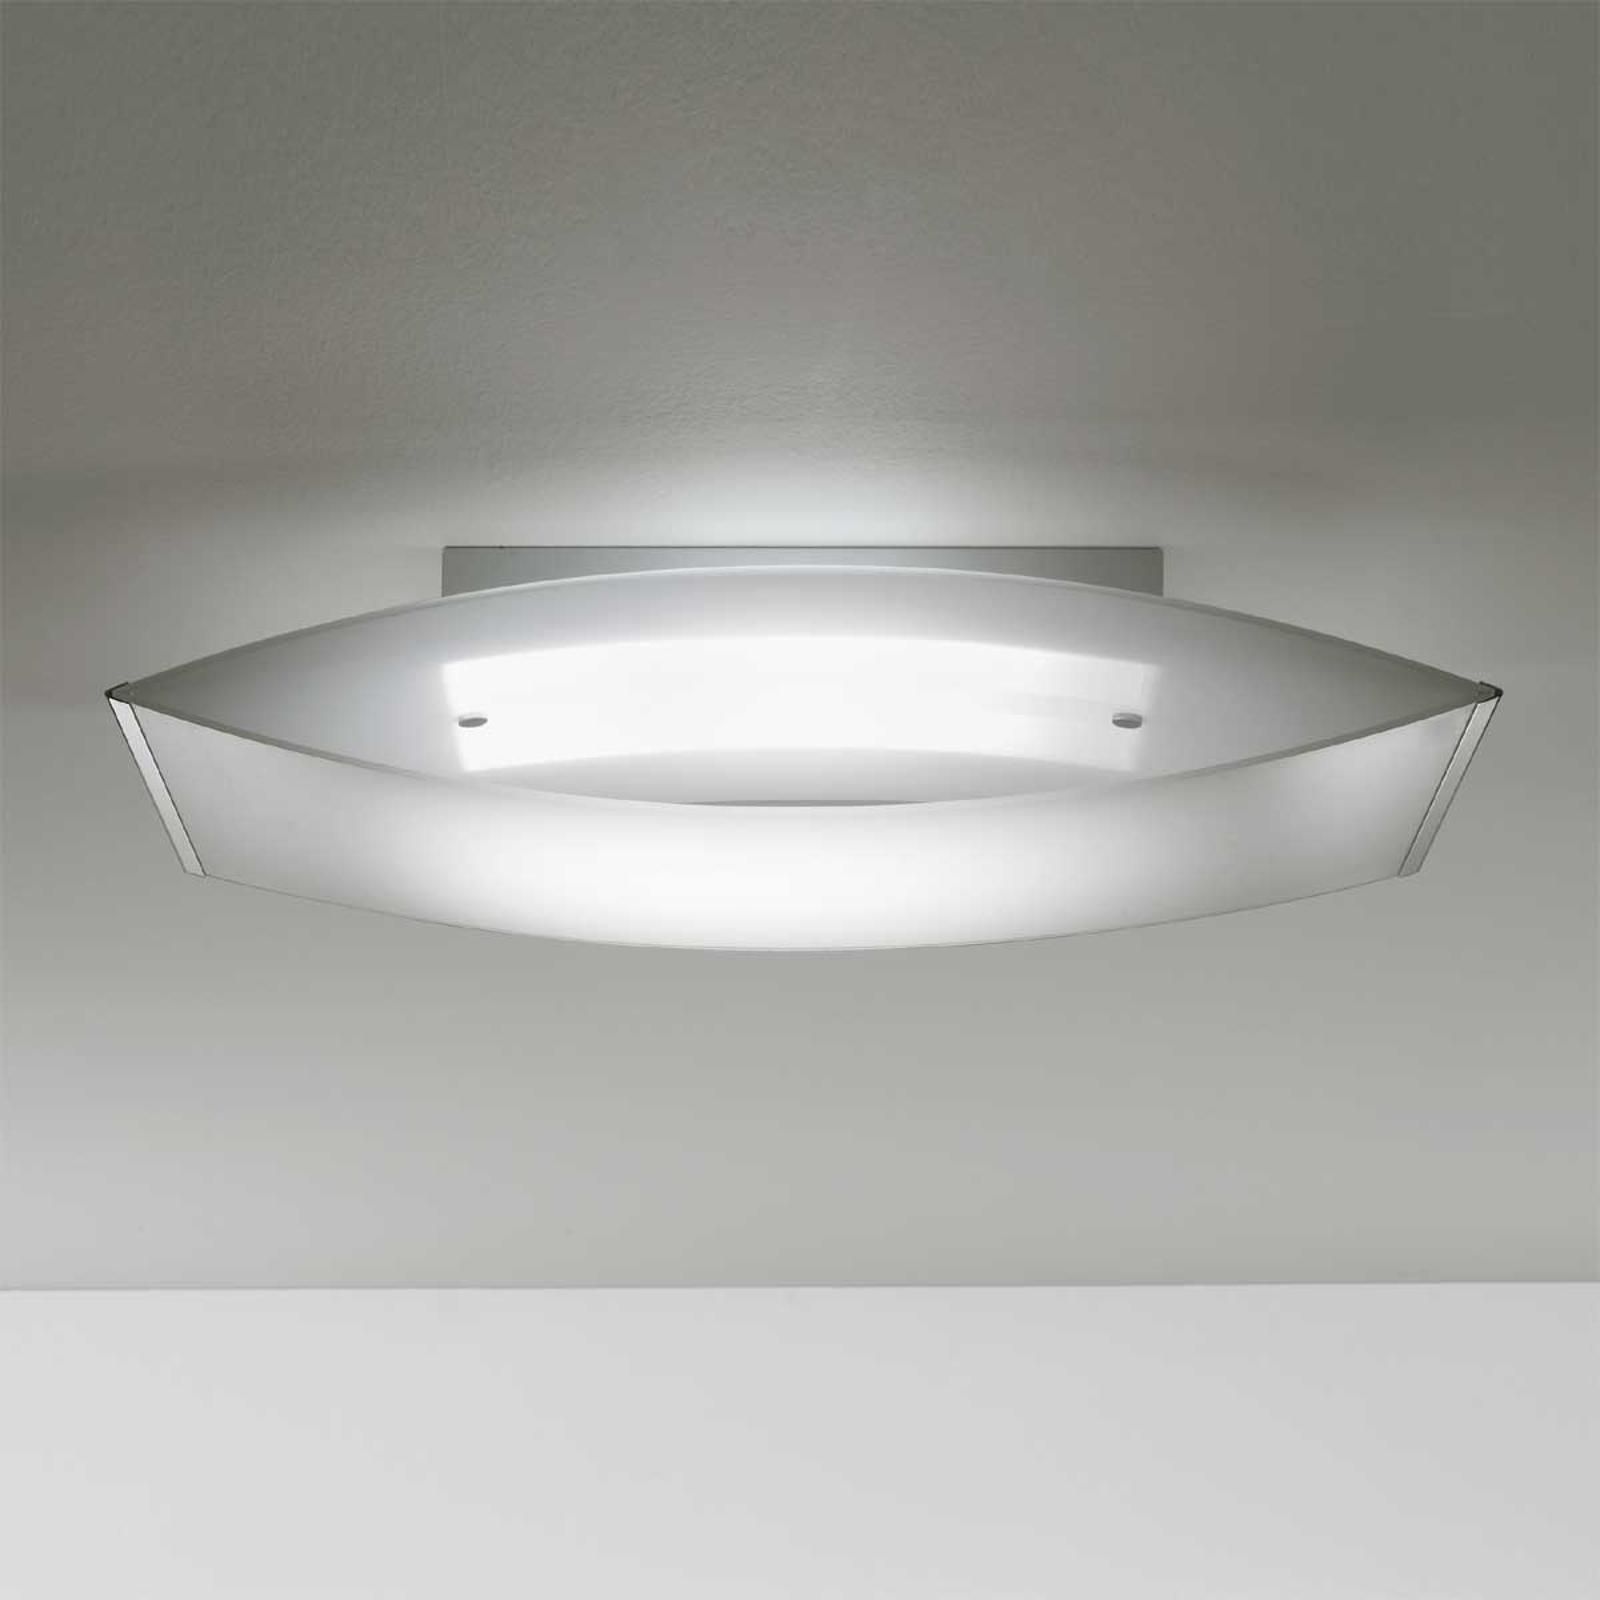 Gewelfde plafondlamp POEMA 9130, 66 x 34 cm